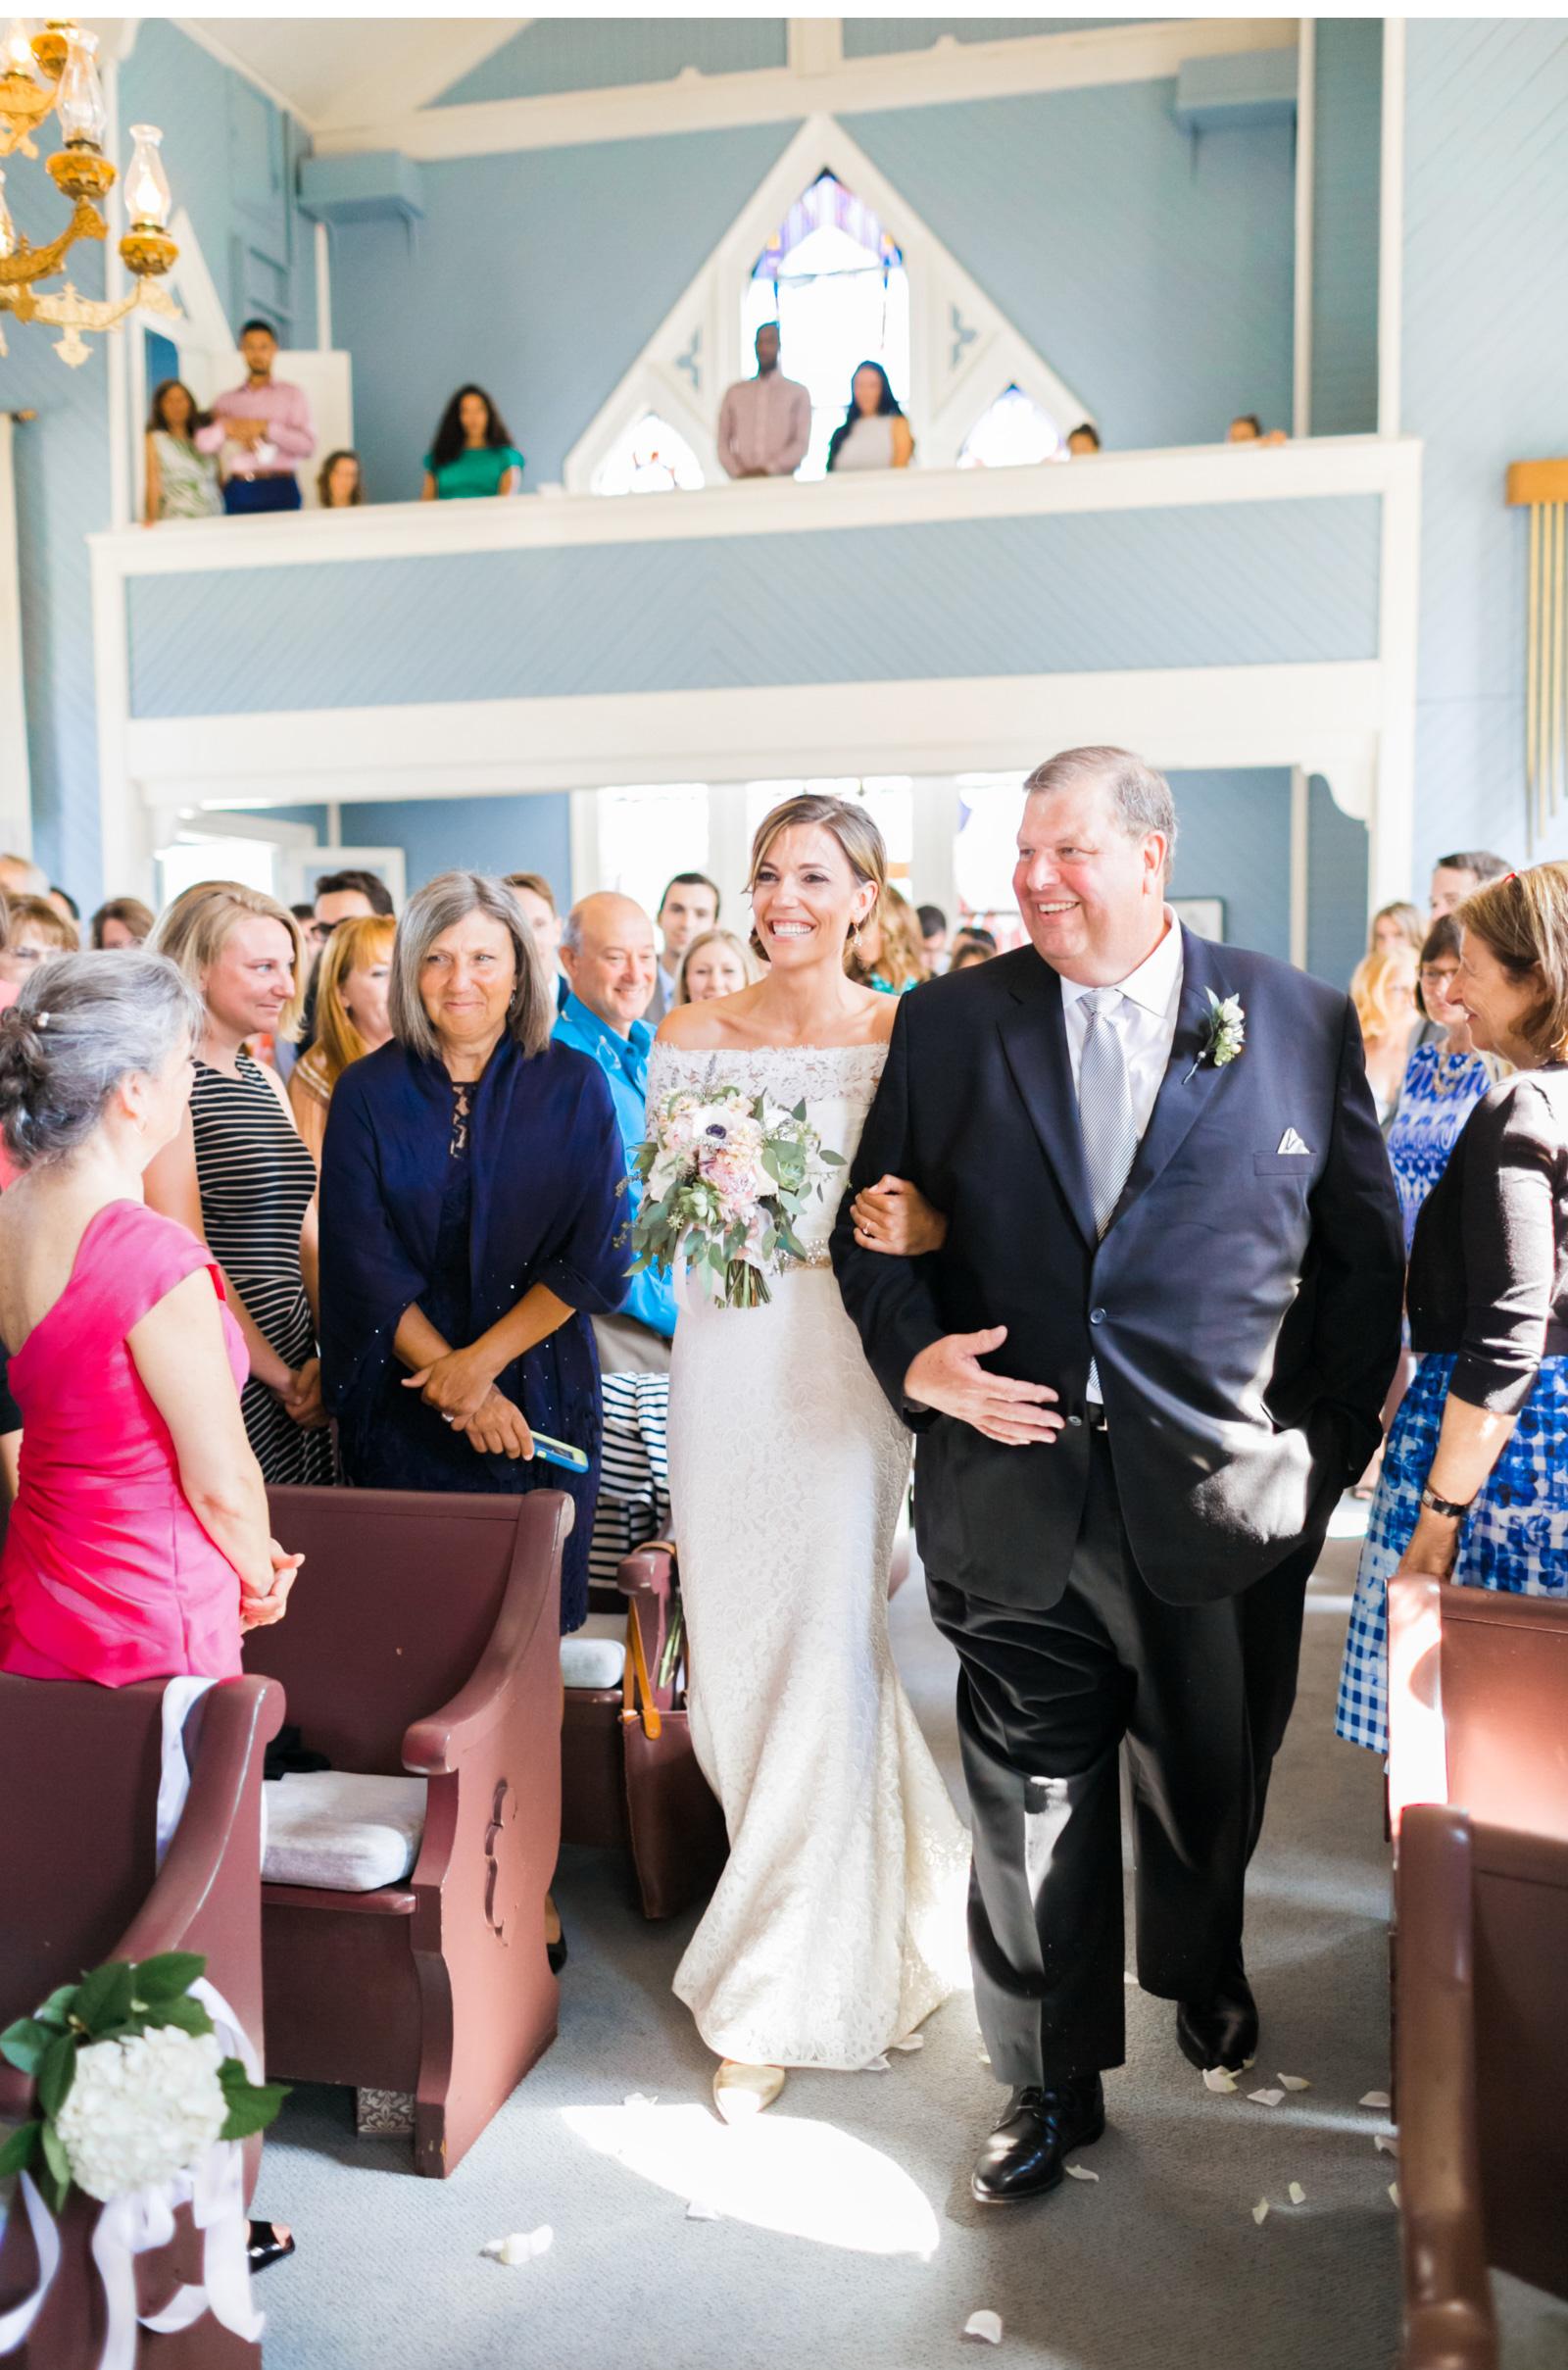 Mendocino-Wedding-Natalie-Schutt-Photography_05.jpg